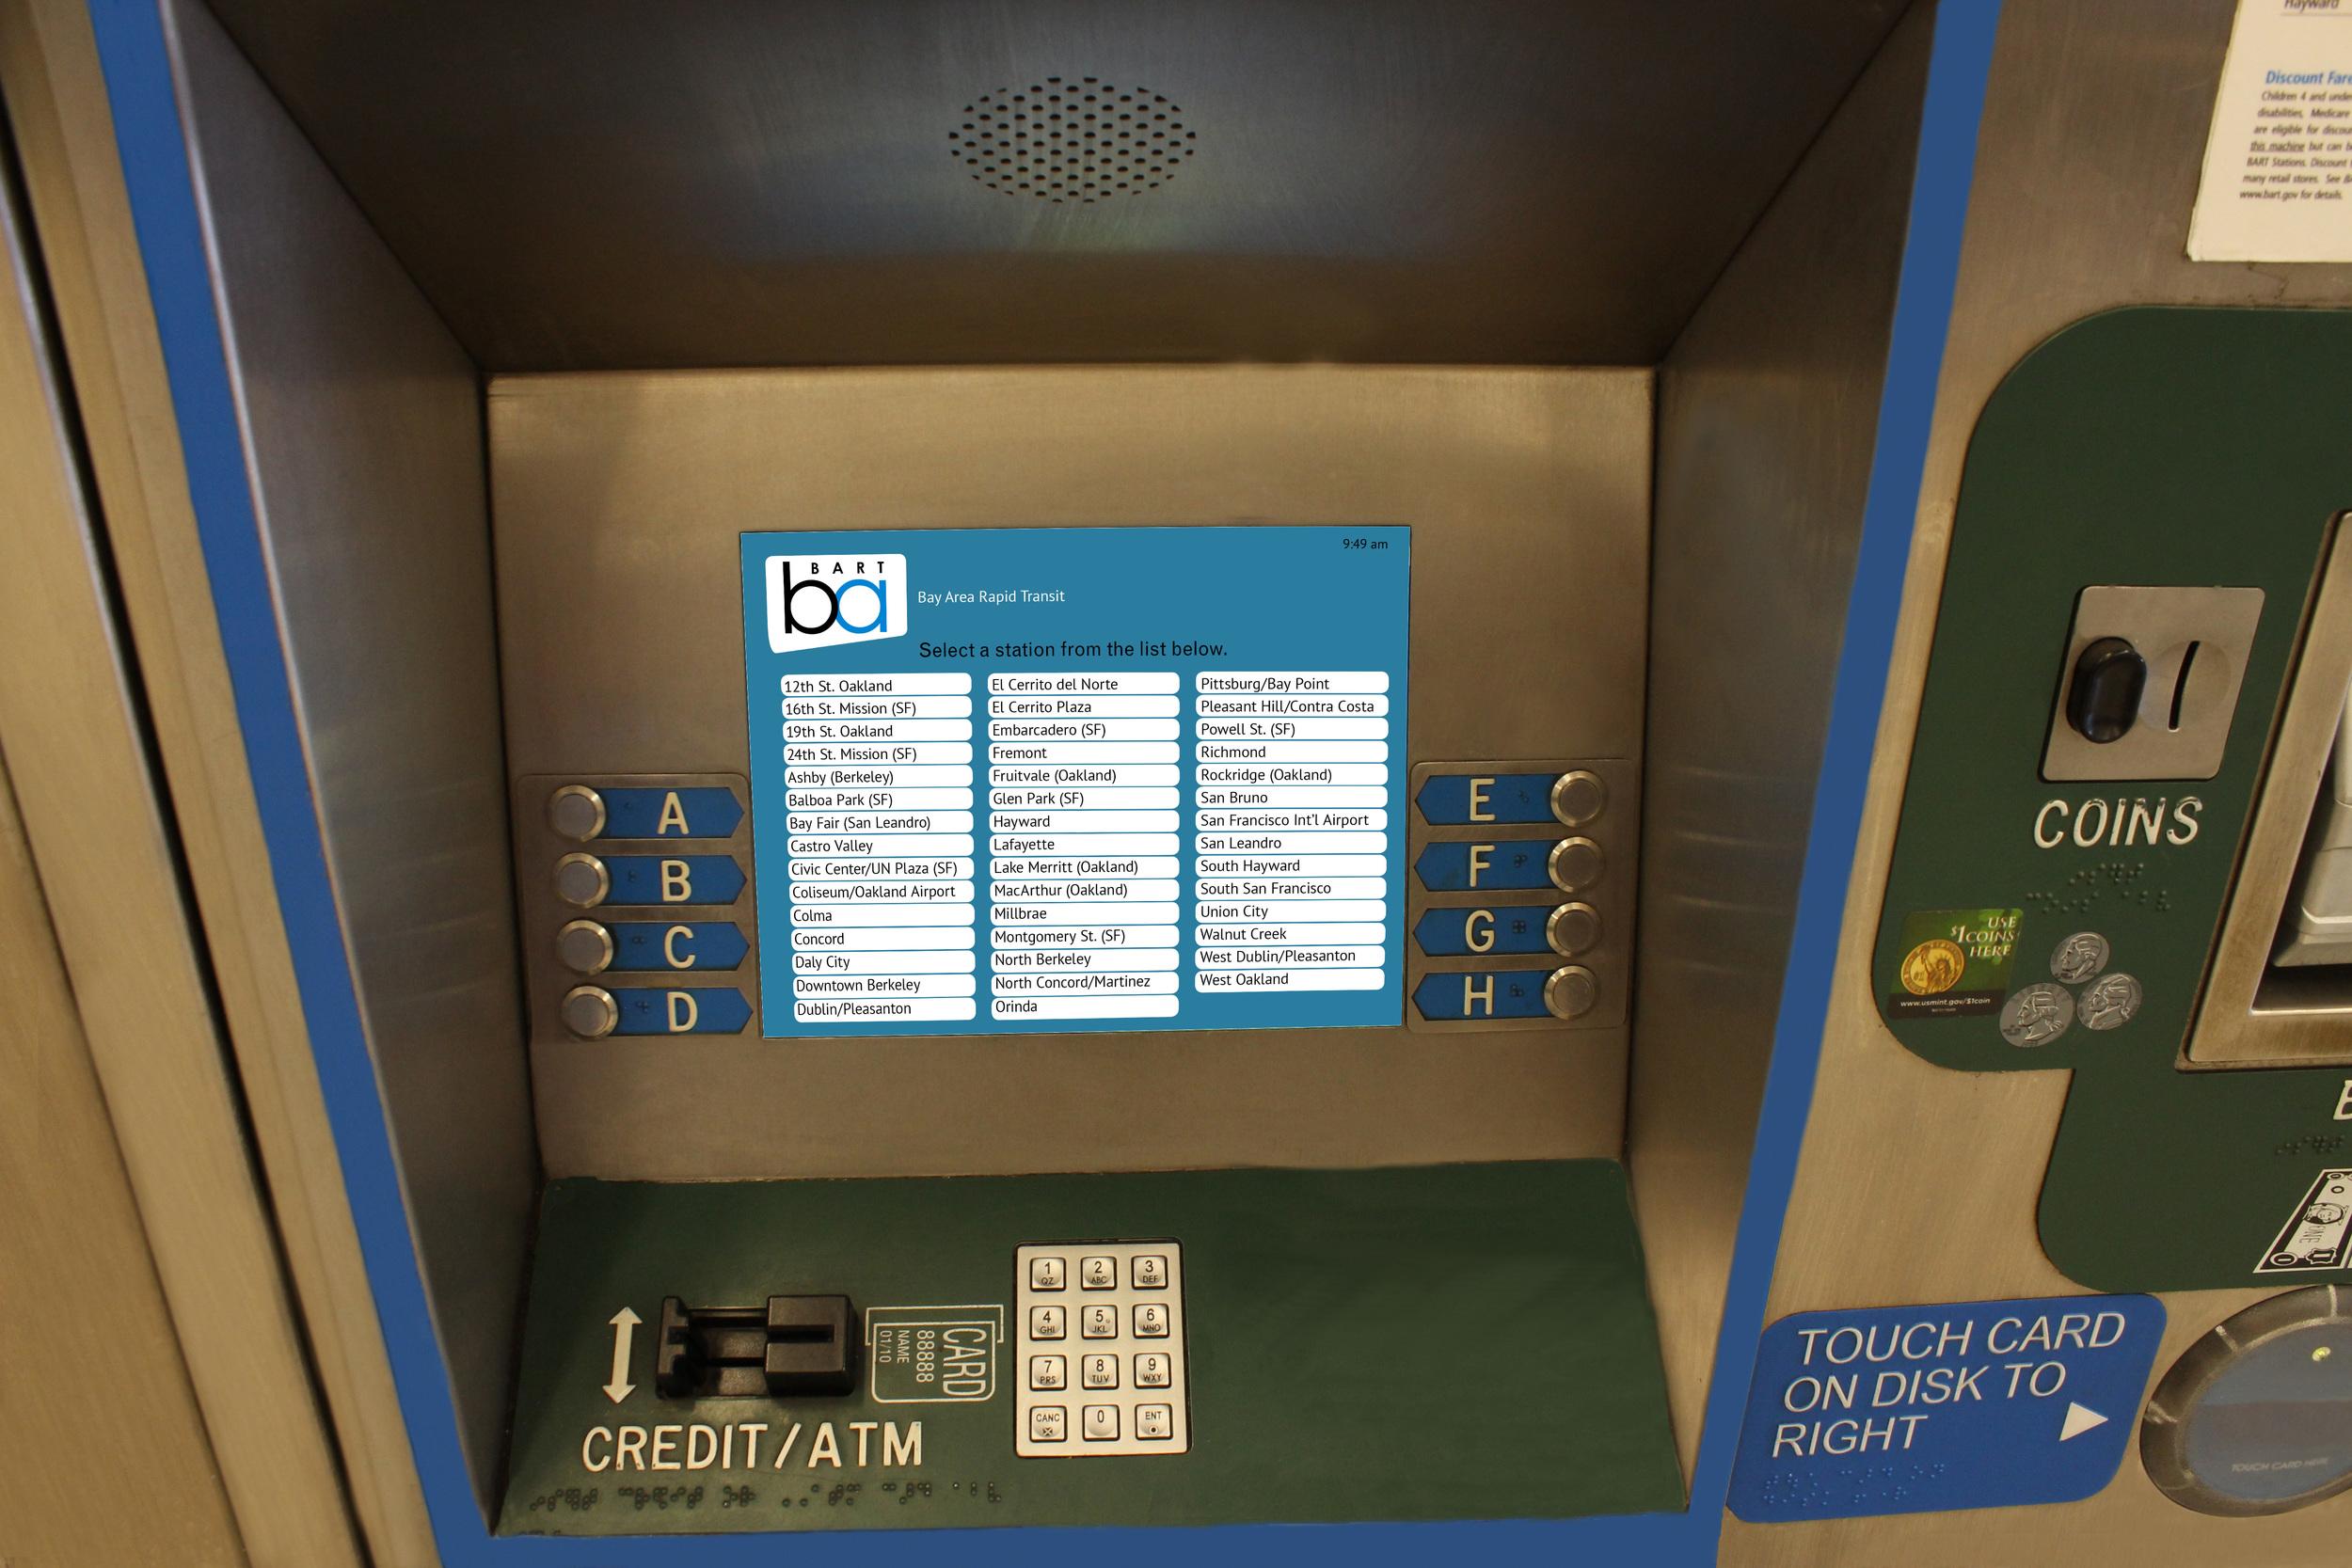 Kiosk2Shailongcreative.com